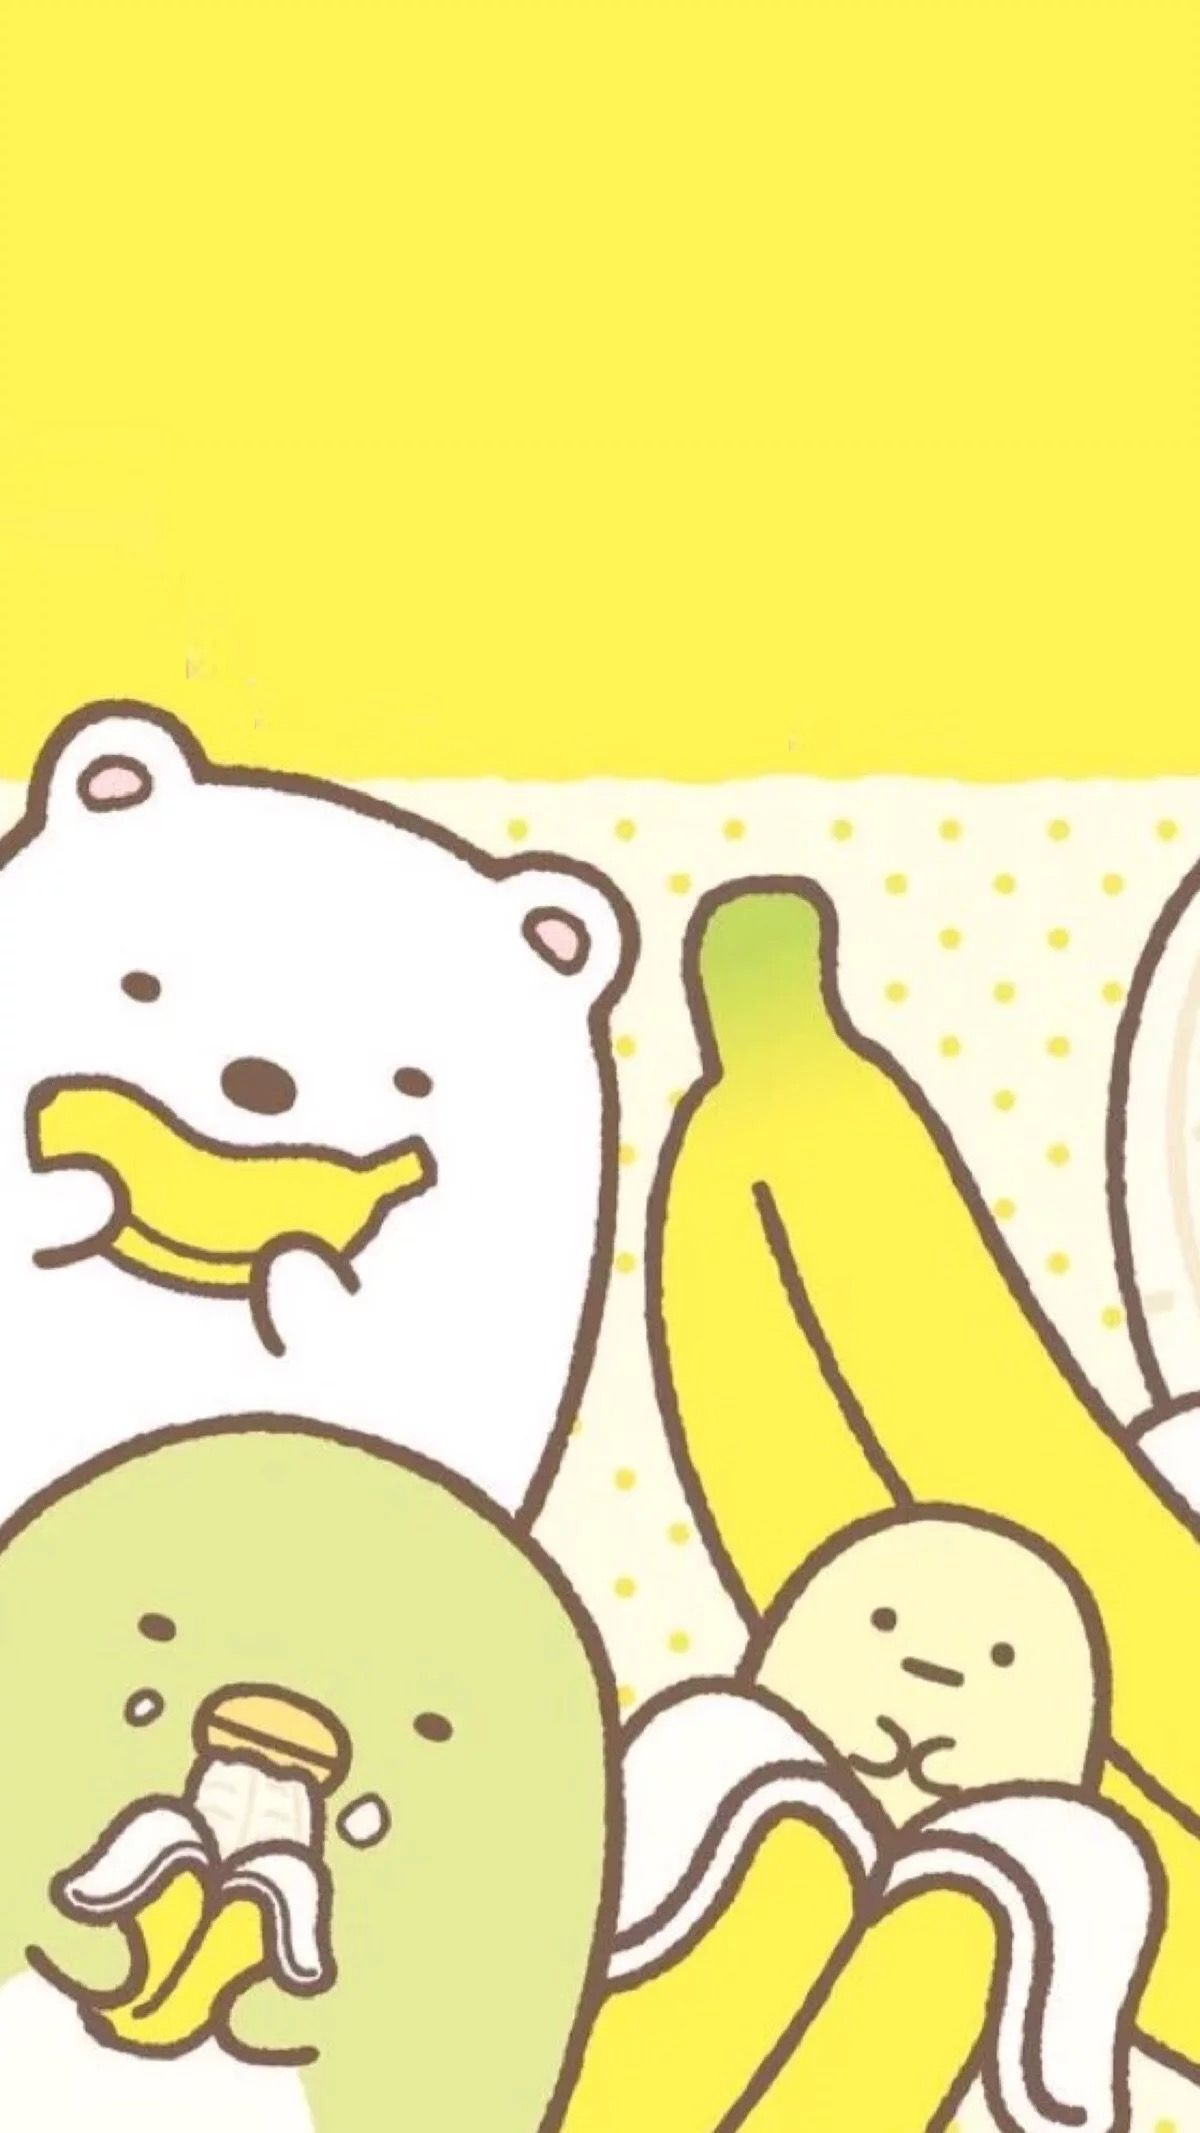 Wallpaper iphone banana - Kawaii Stuff Sanrio Iphone Wallpaper Doodles Cartoons Ipad